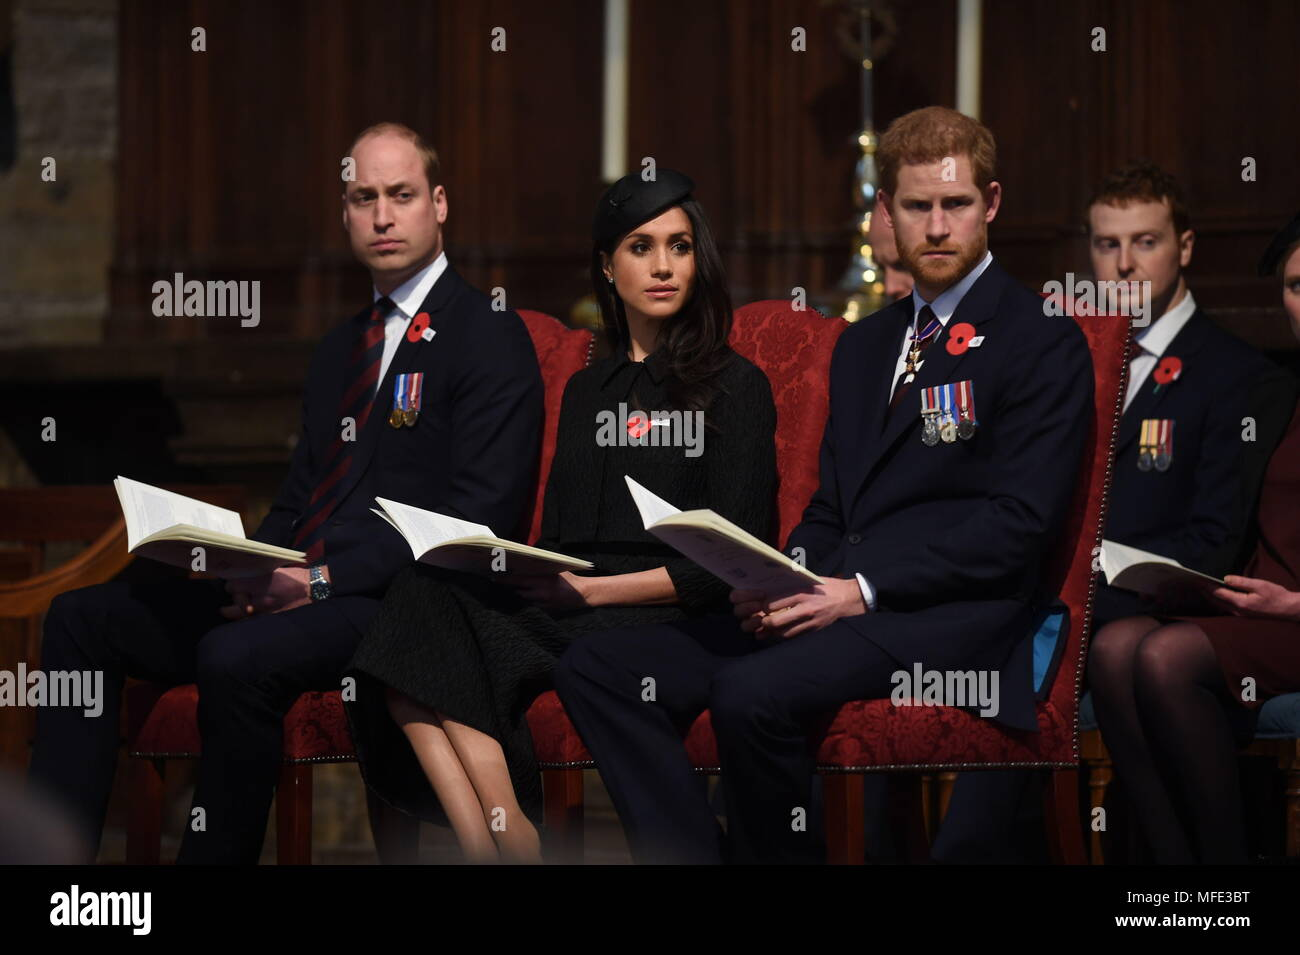 Prinz William (links), Meghan Markle und Prinz Harry im Rahmen des ...